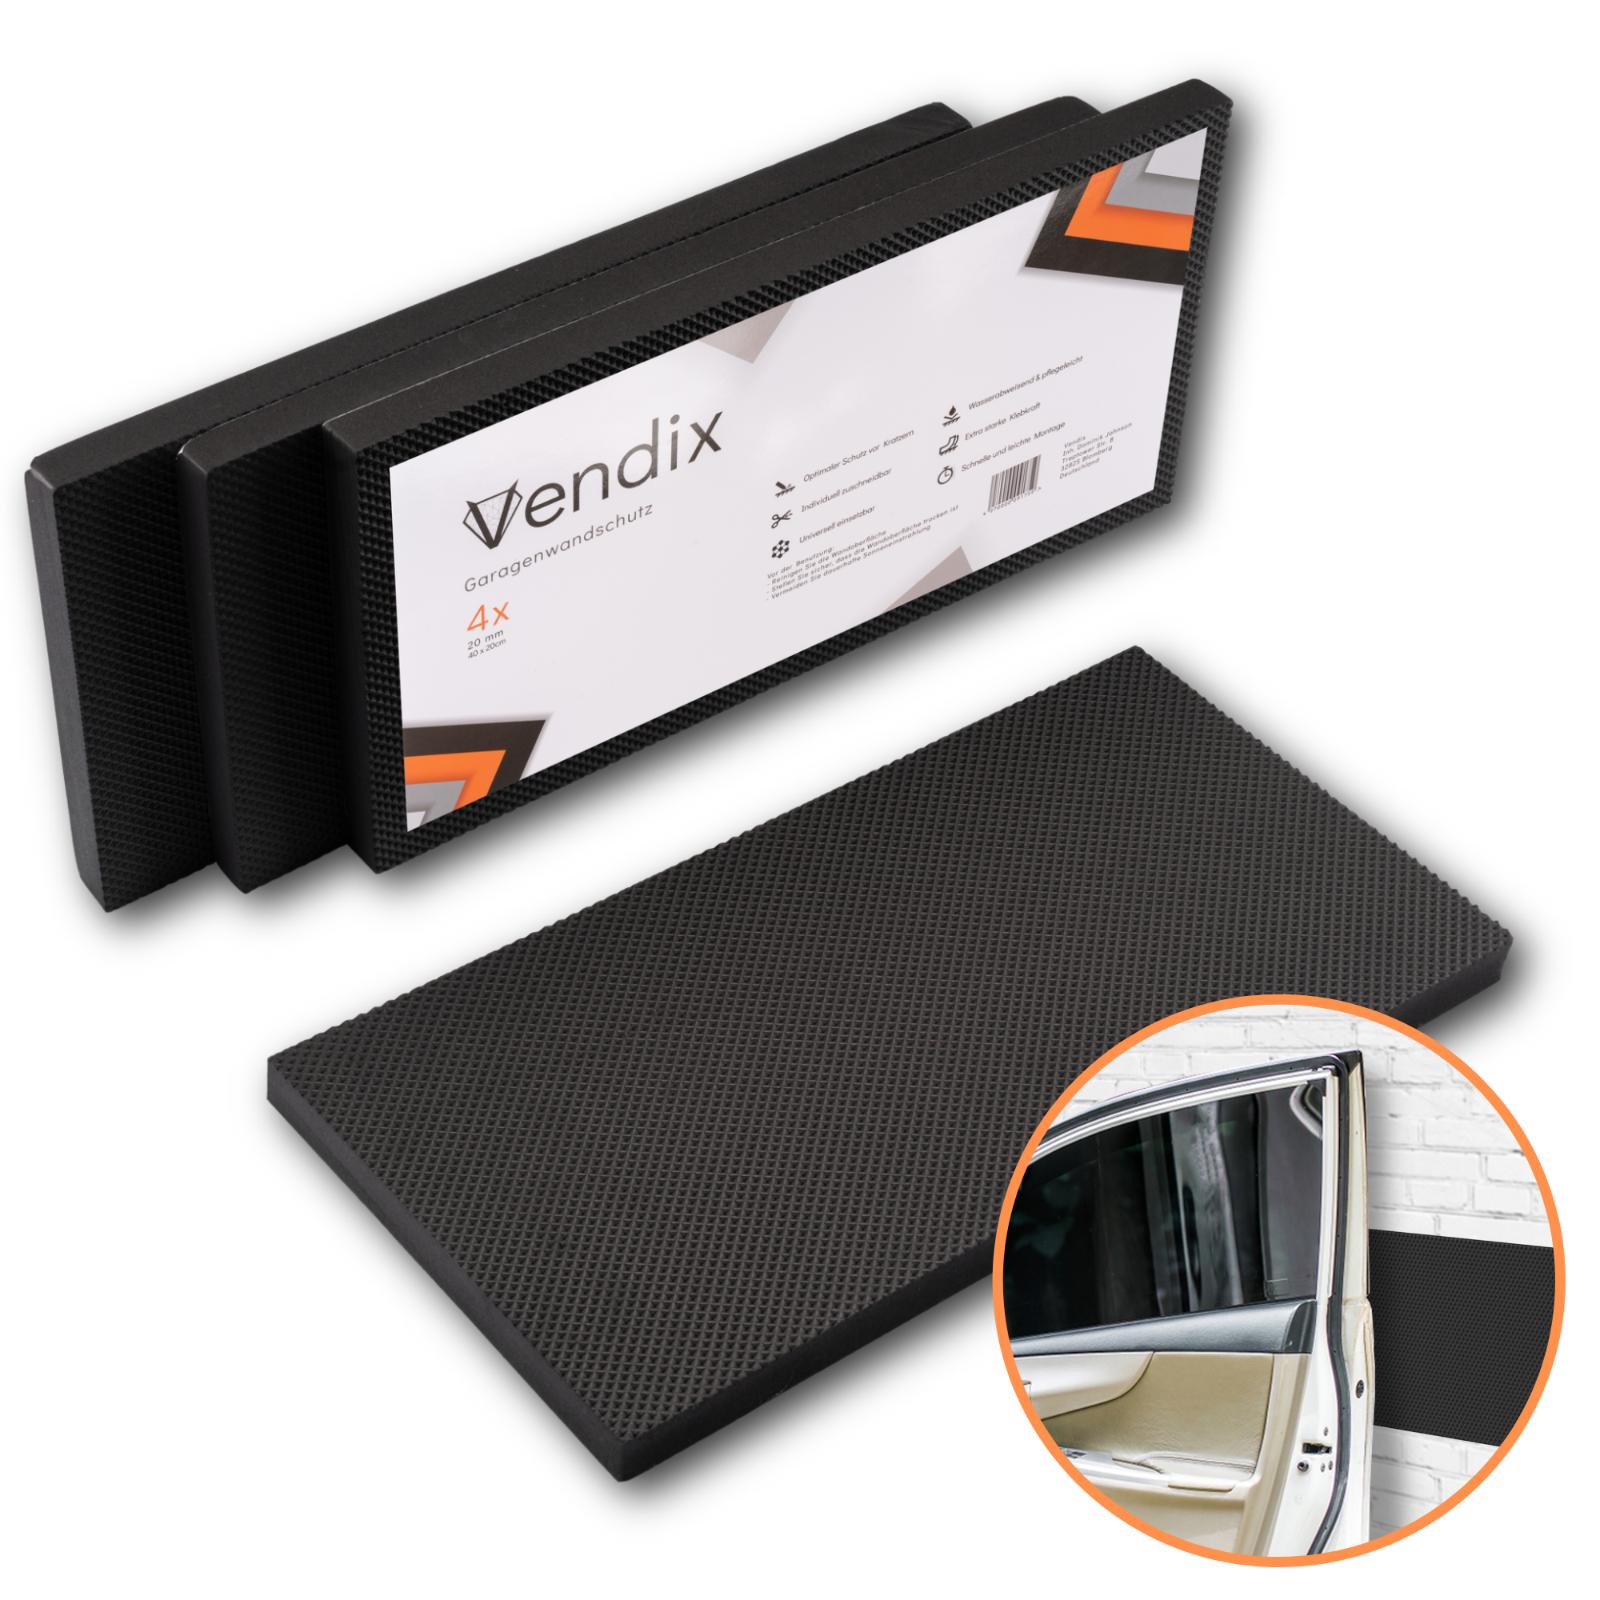 Garagen-Wandschutz selbstklebend - EXTRA DICK - optimaler Auto Türkantenschutz